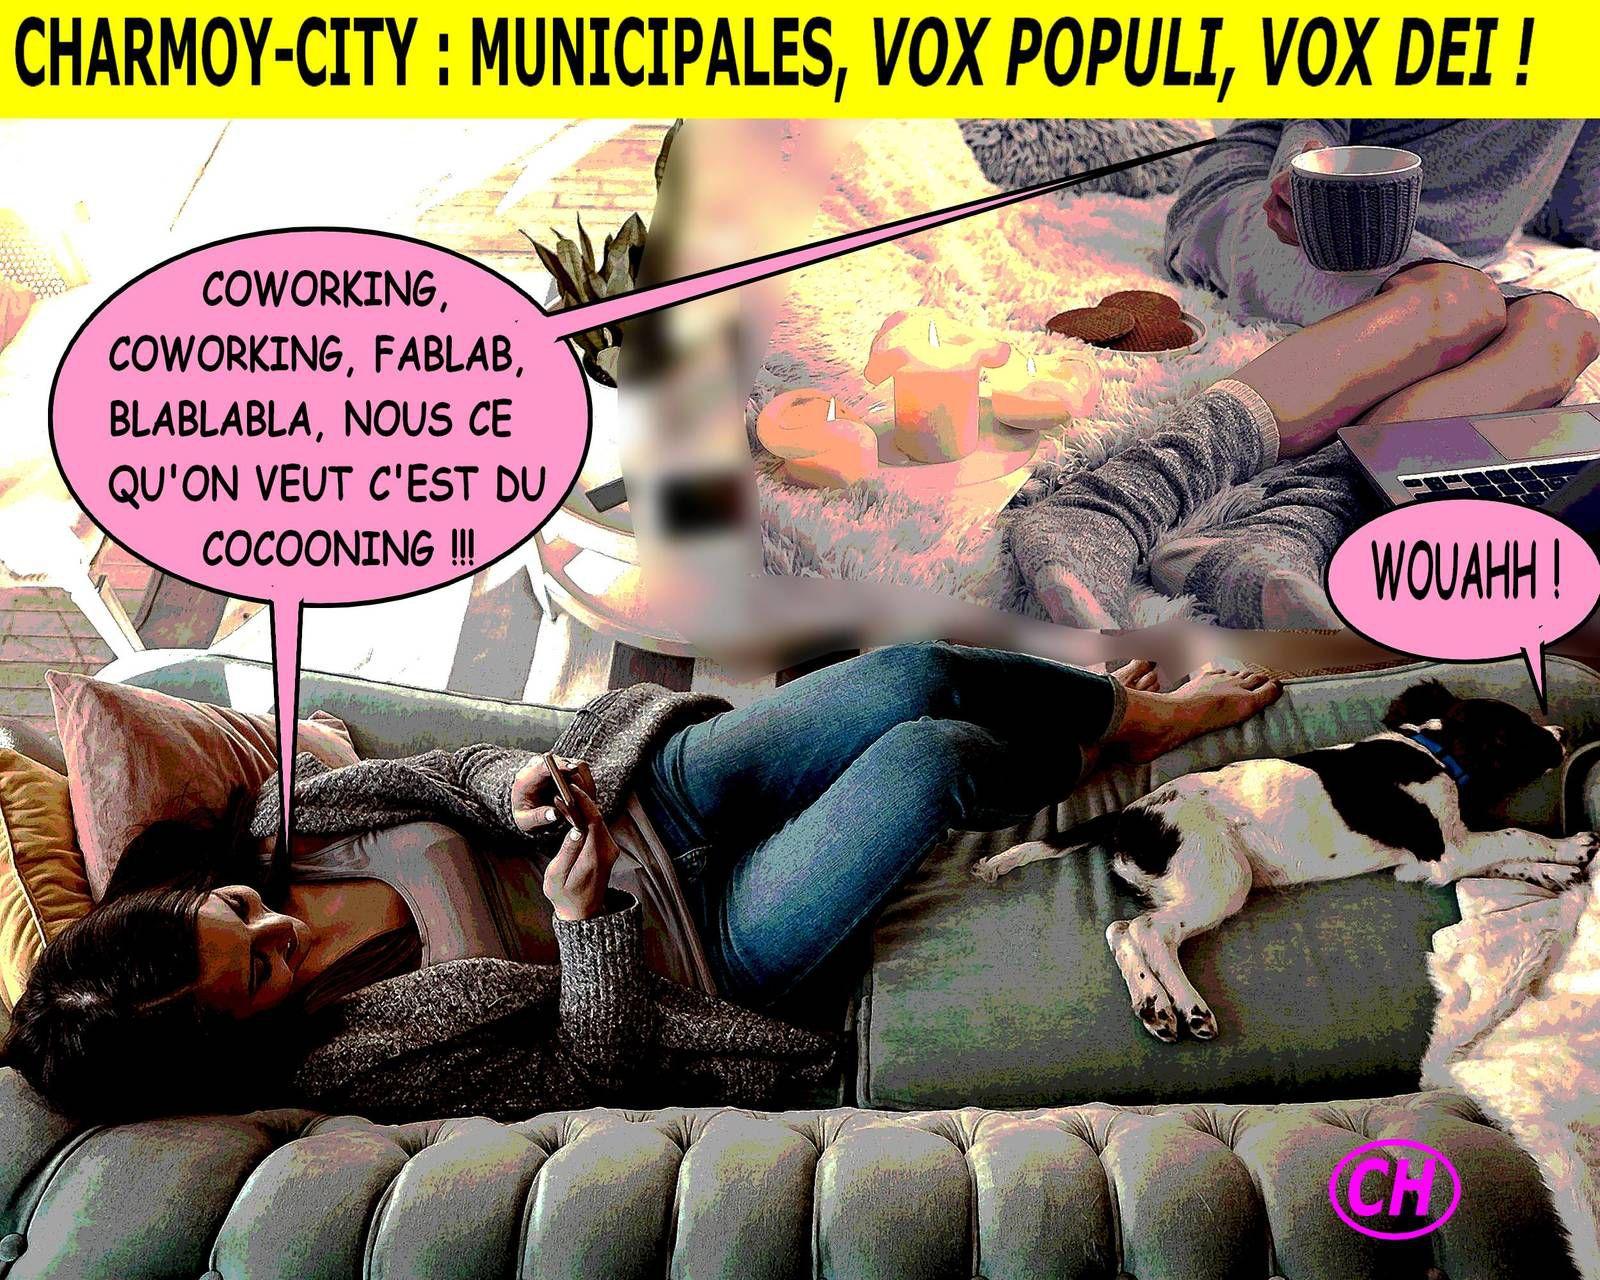 Charmoy-City, municipales, vox populi, vox dei.jpg